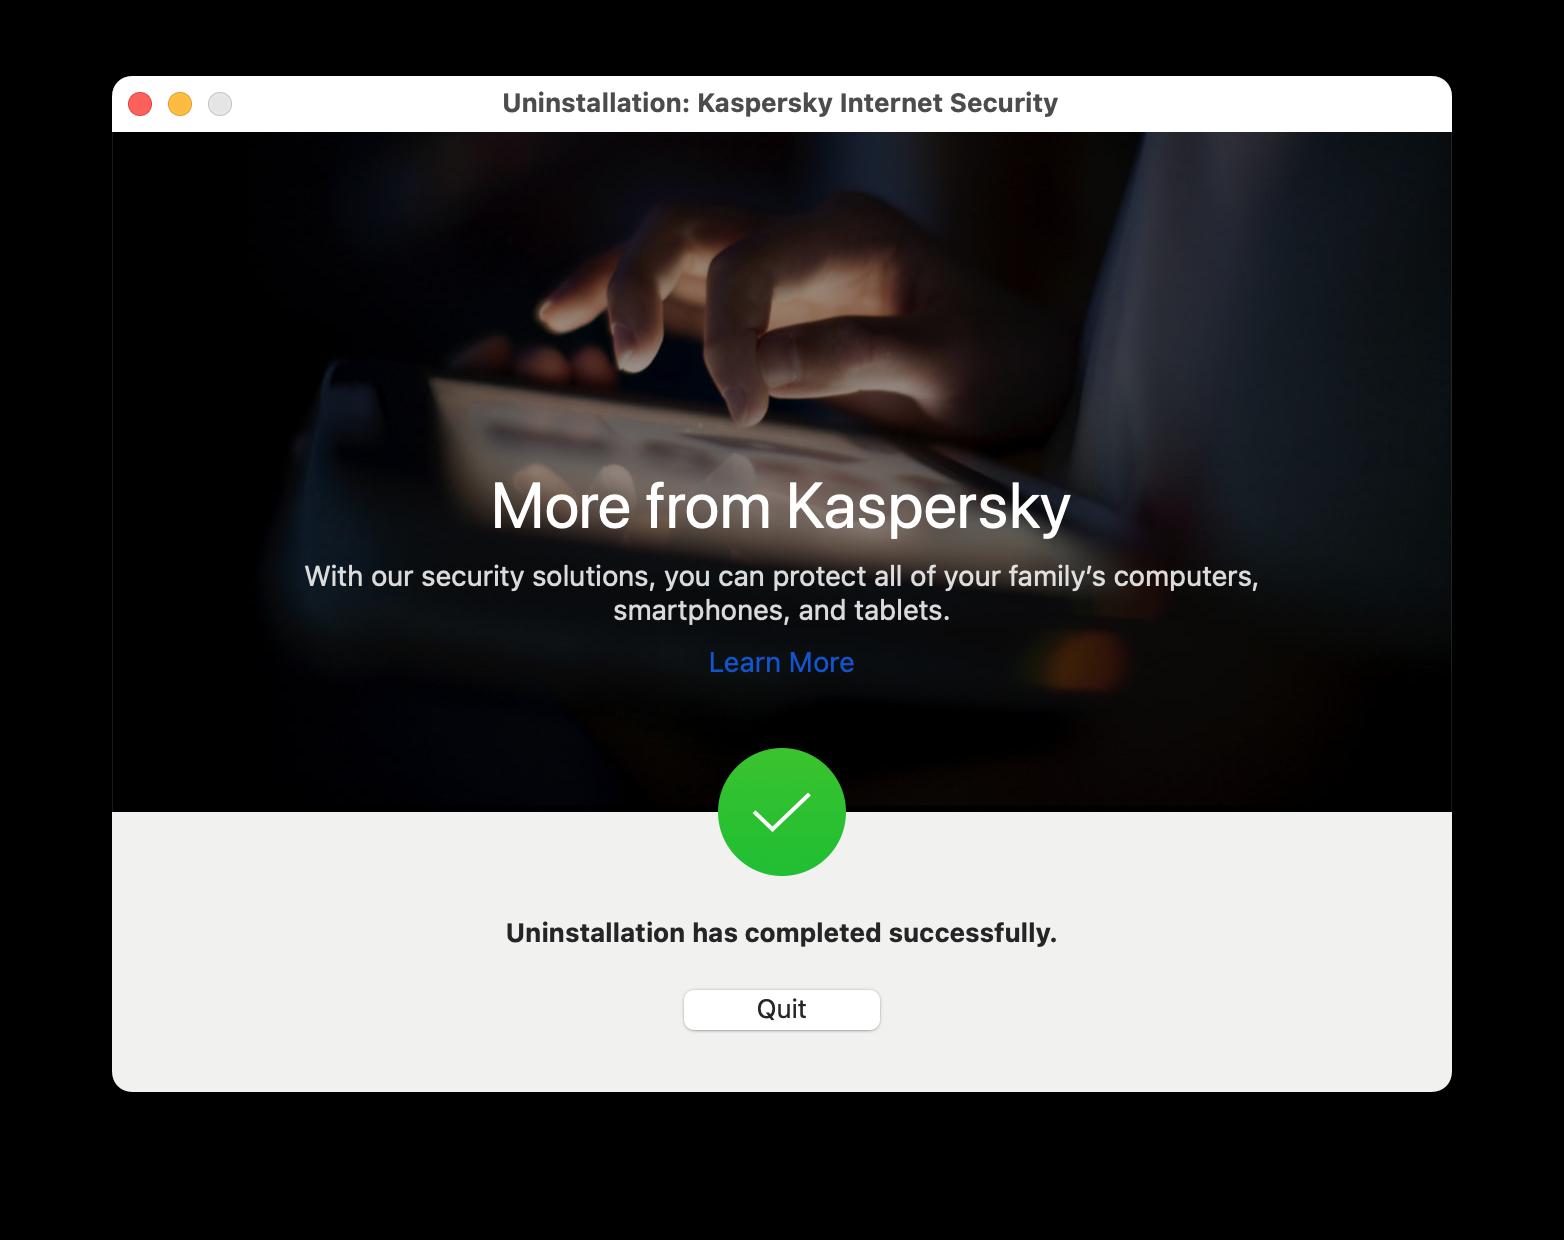 Kaspersky uninstallation window